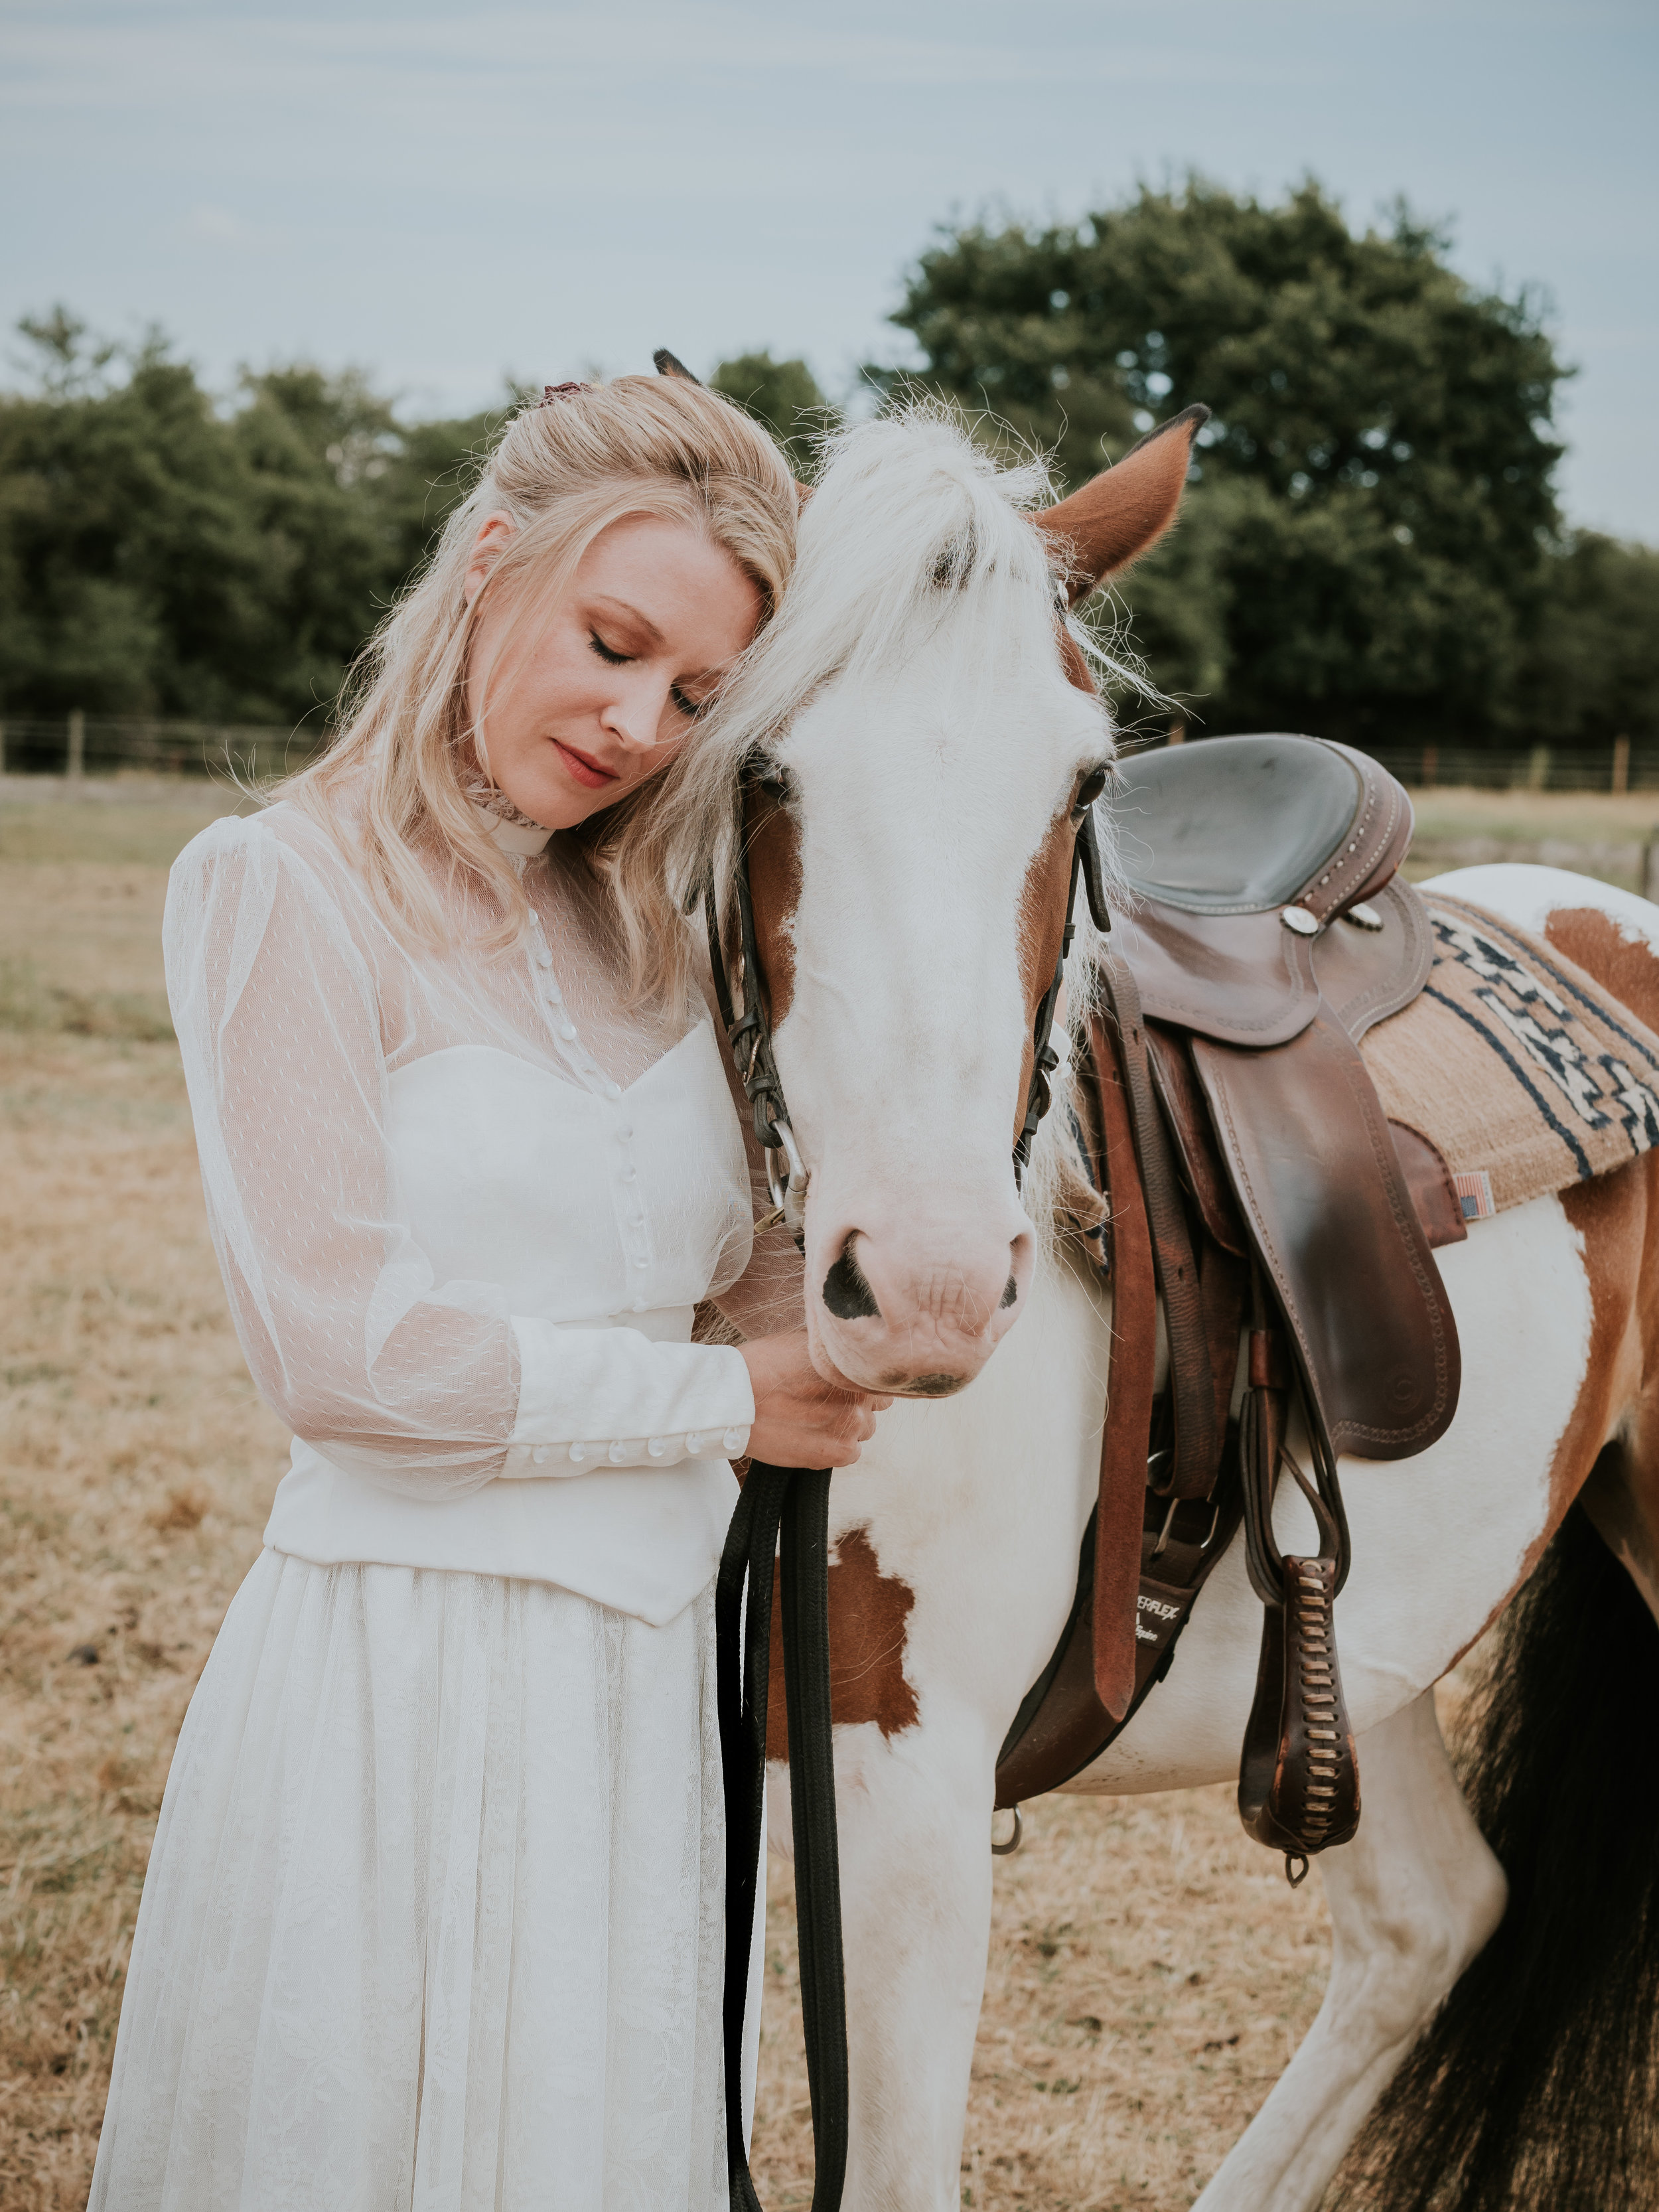 Jessica-Milberg-Photography-Brighton-London-Wedding-Fashion-Photographer-Creative-Wedding-Dress-5.jpg